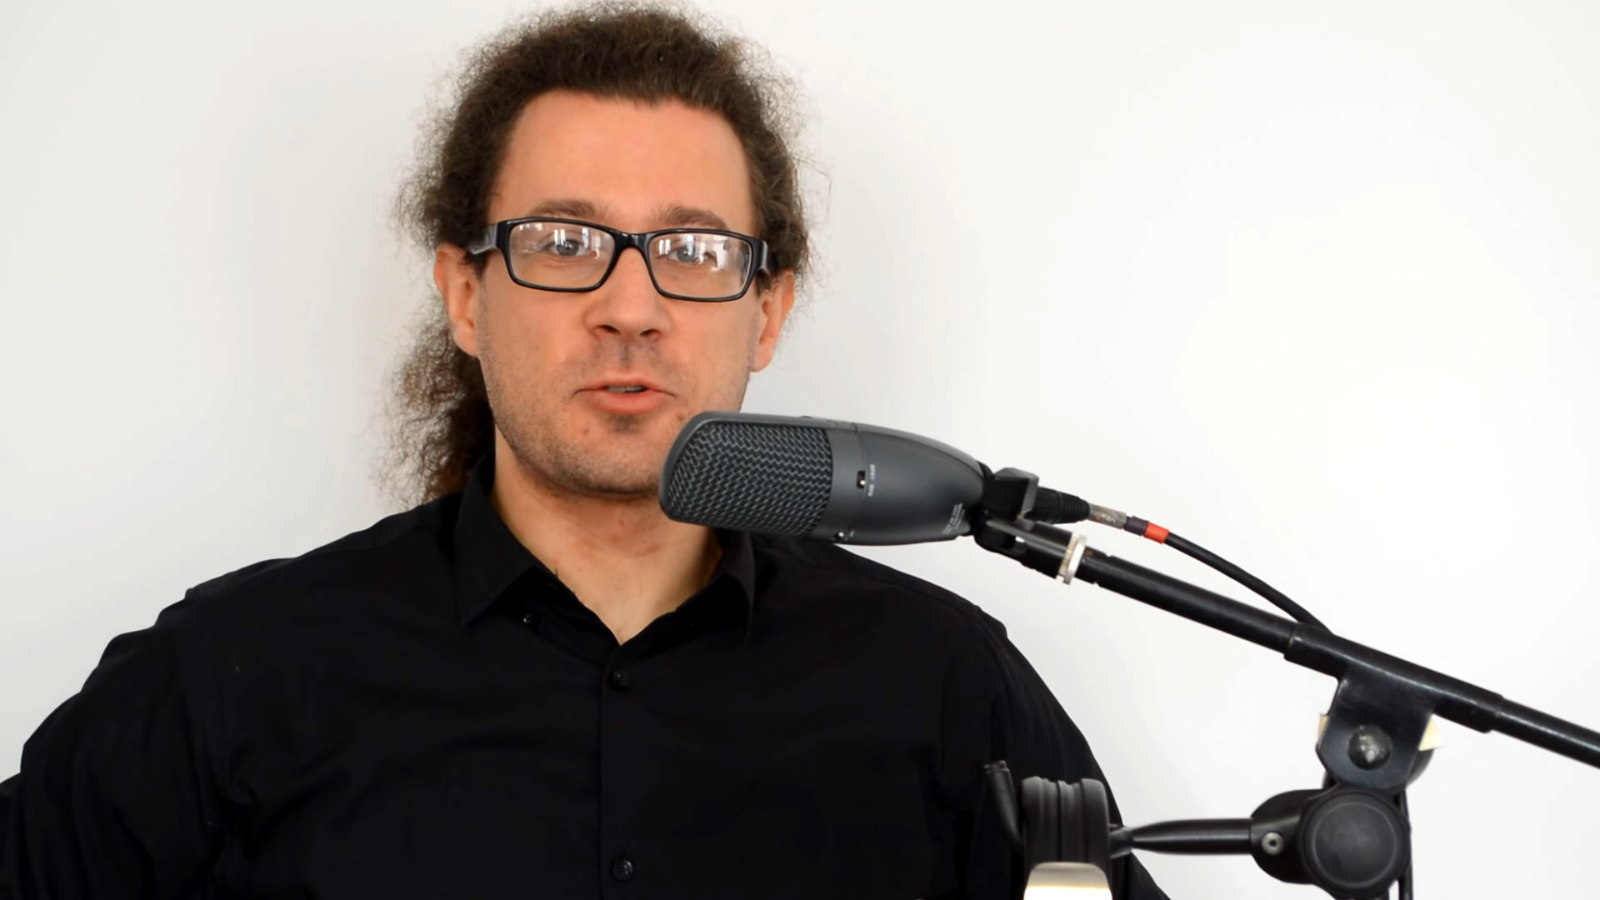 Paweł Karliński - Soudarion